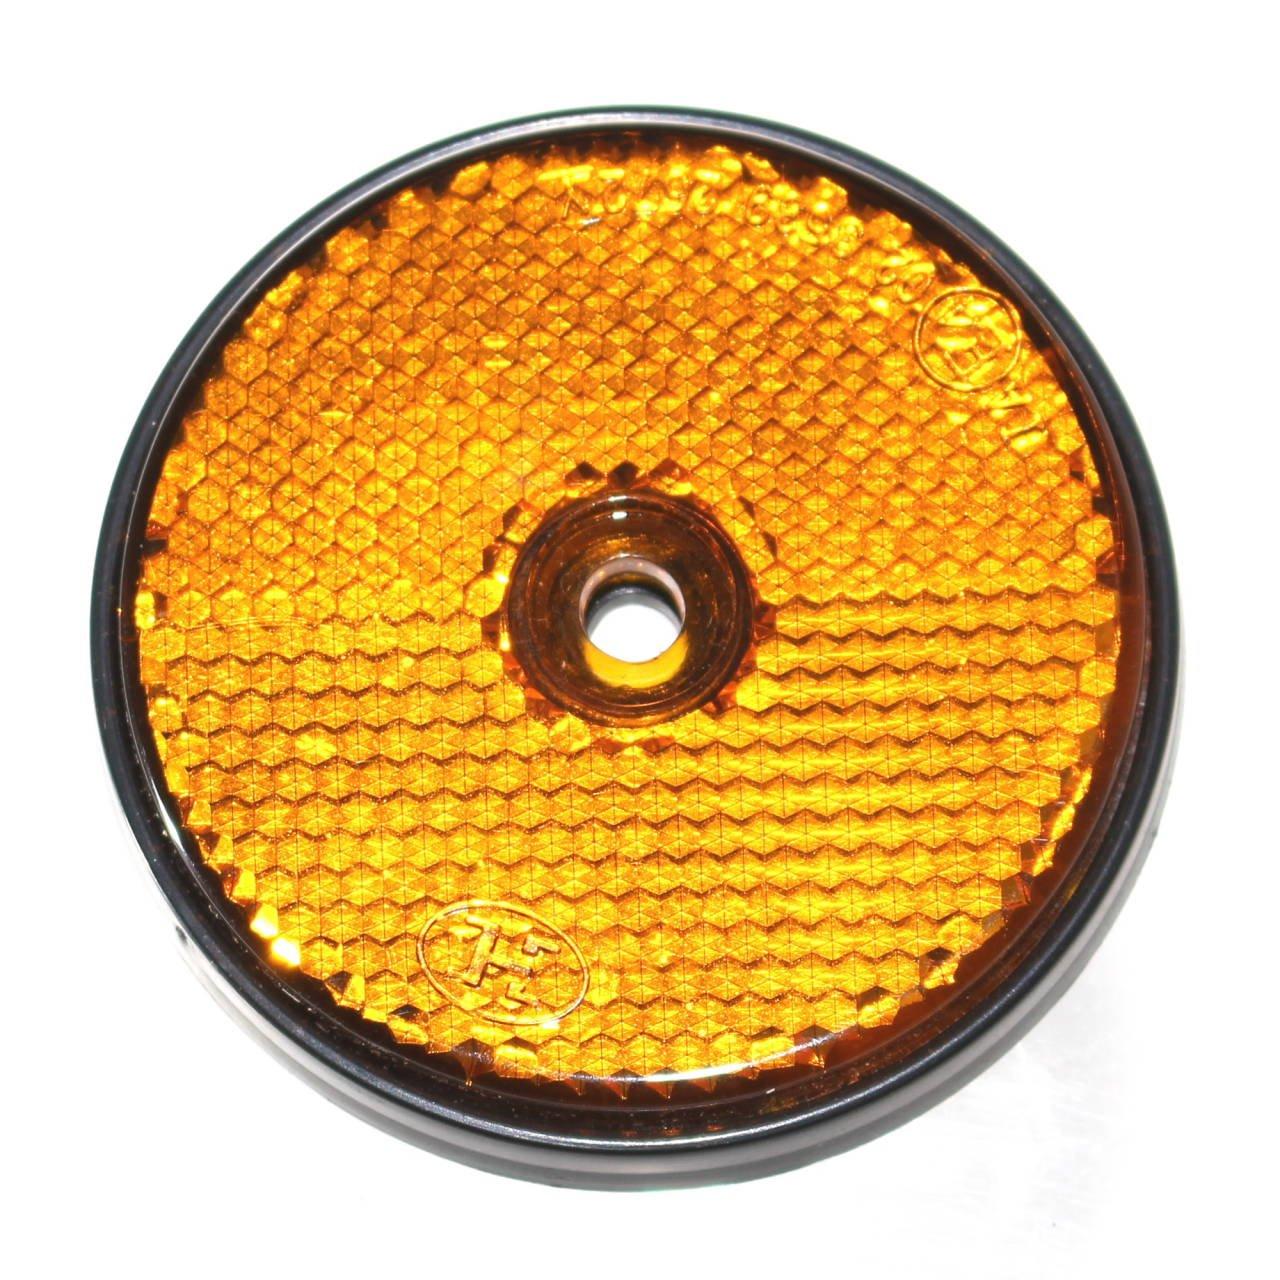 DKB Reflektor Orange f H/änger Trailer Reflektor Katzenauge Rund /Ø 60 mm R/ückstrahler